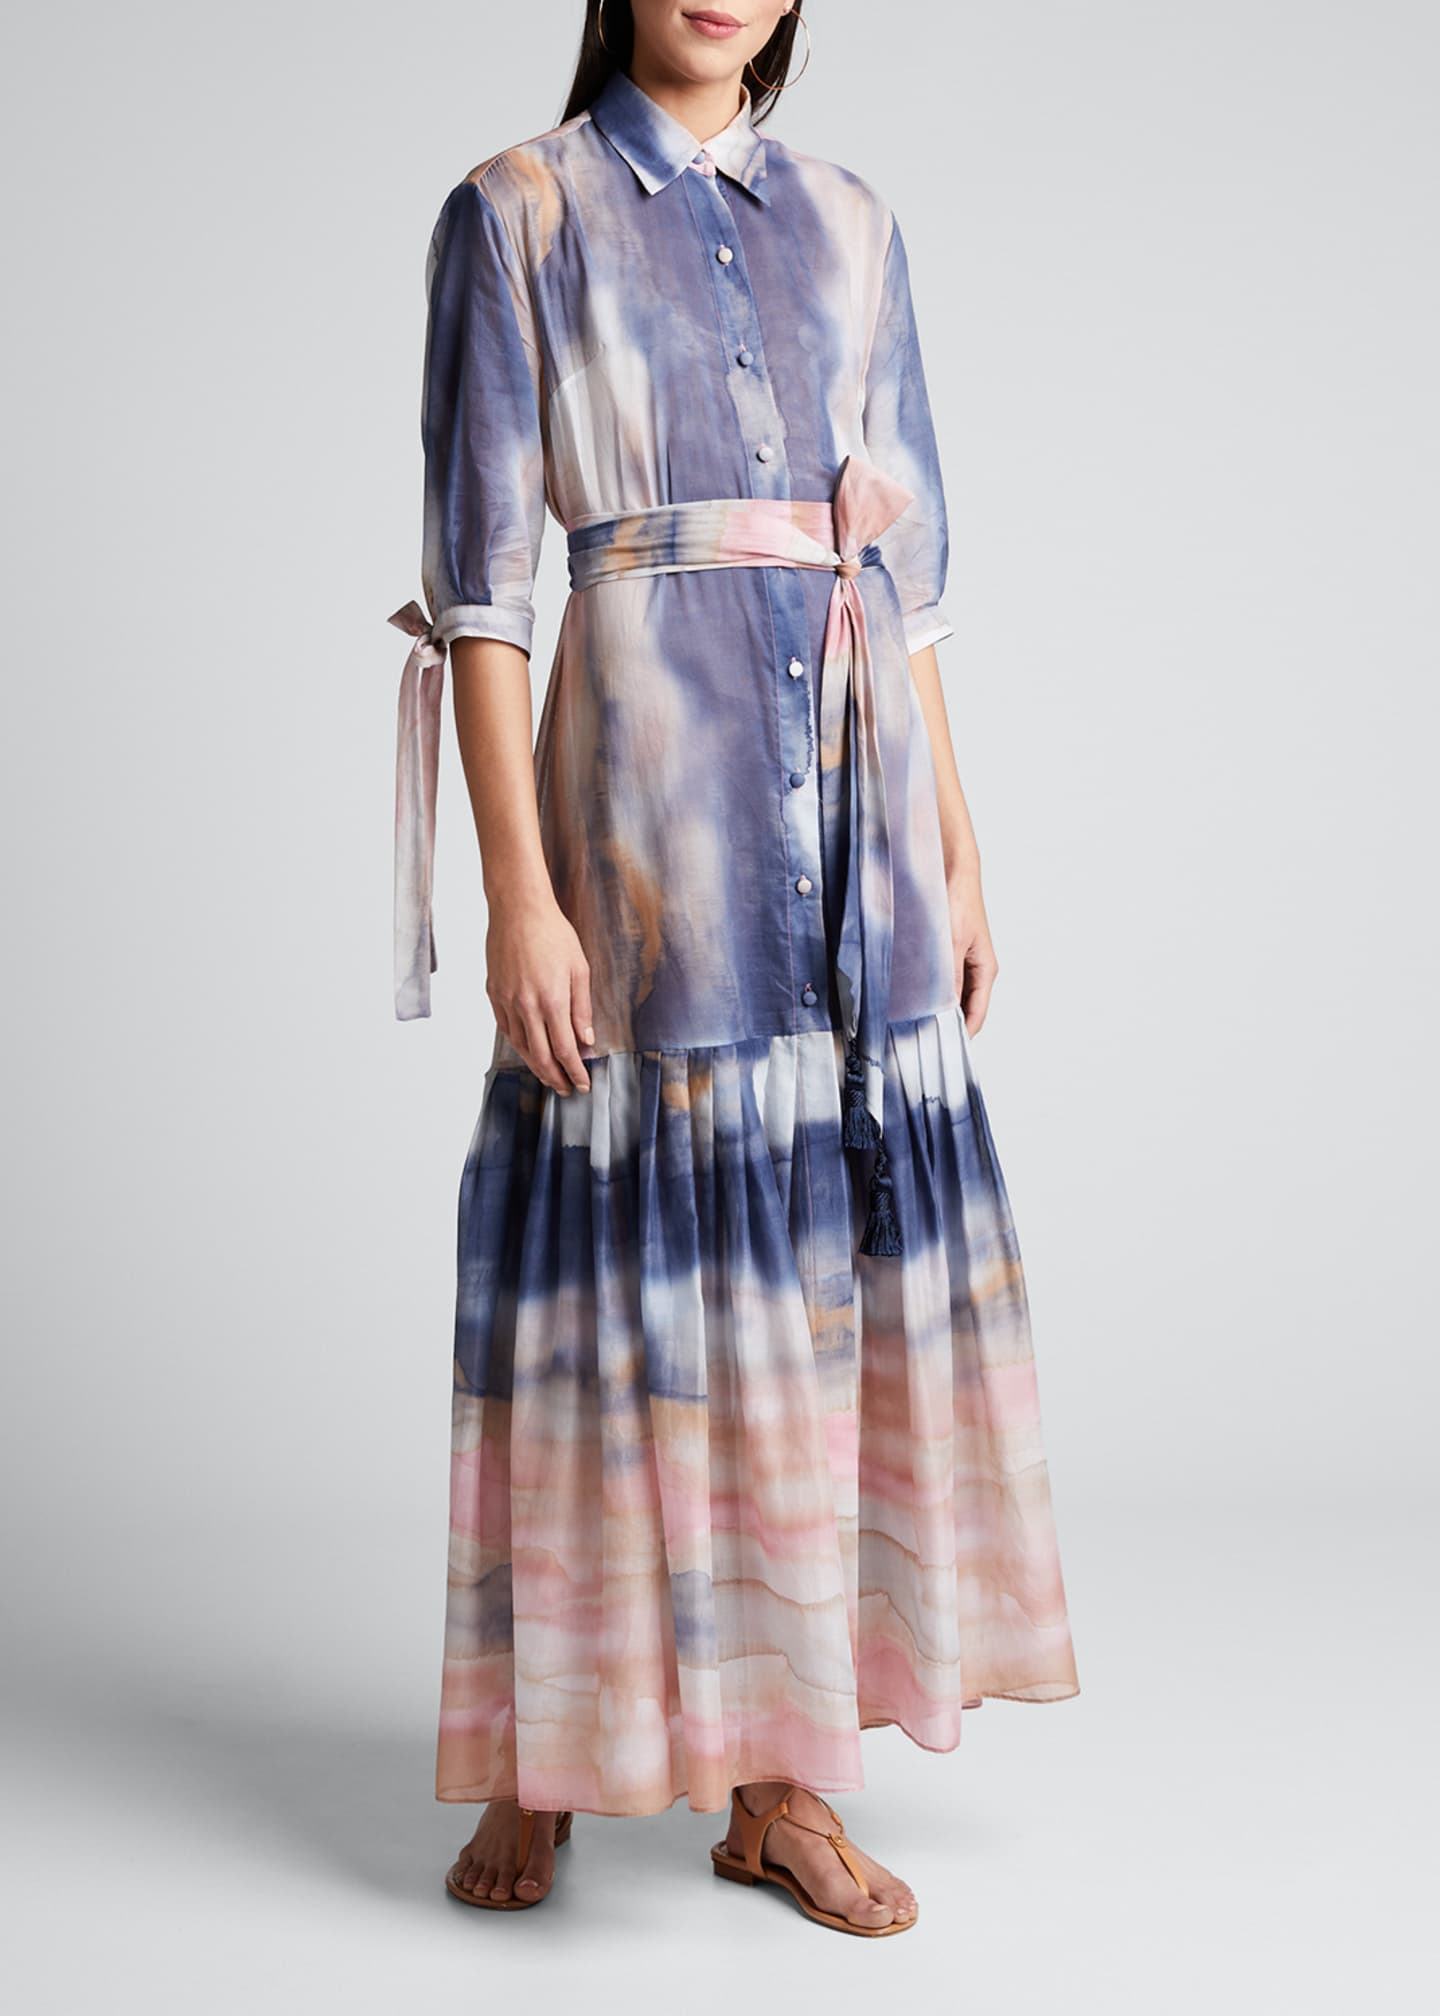 Evi Grintela Mouassine Sheer Tie-Dye Dress